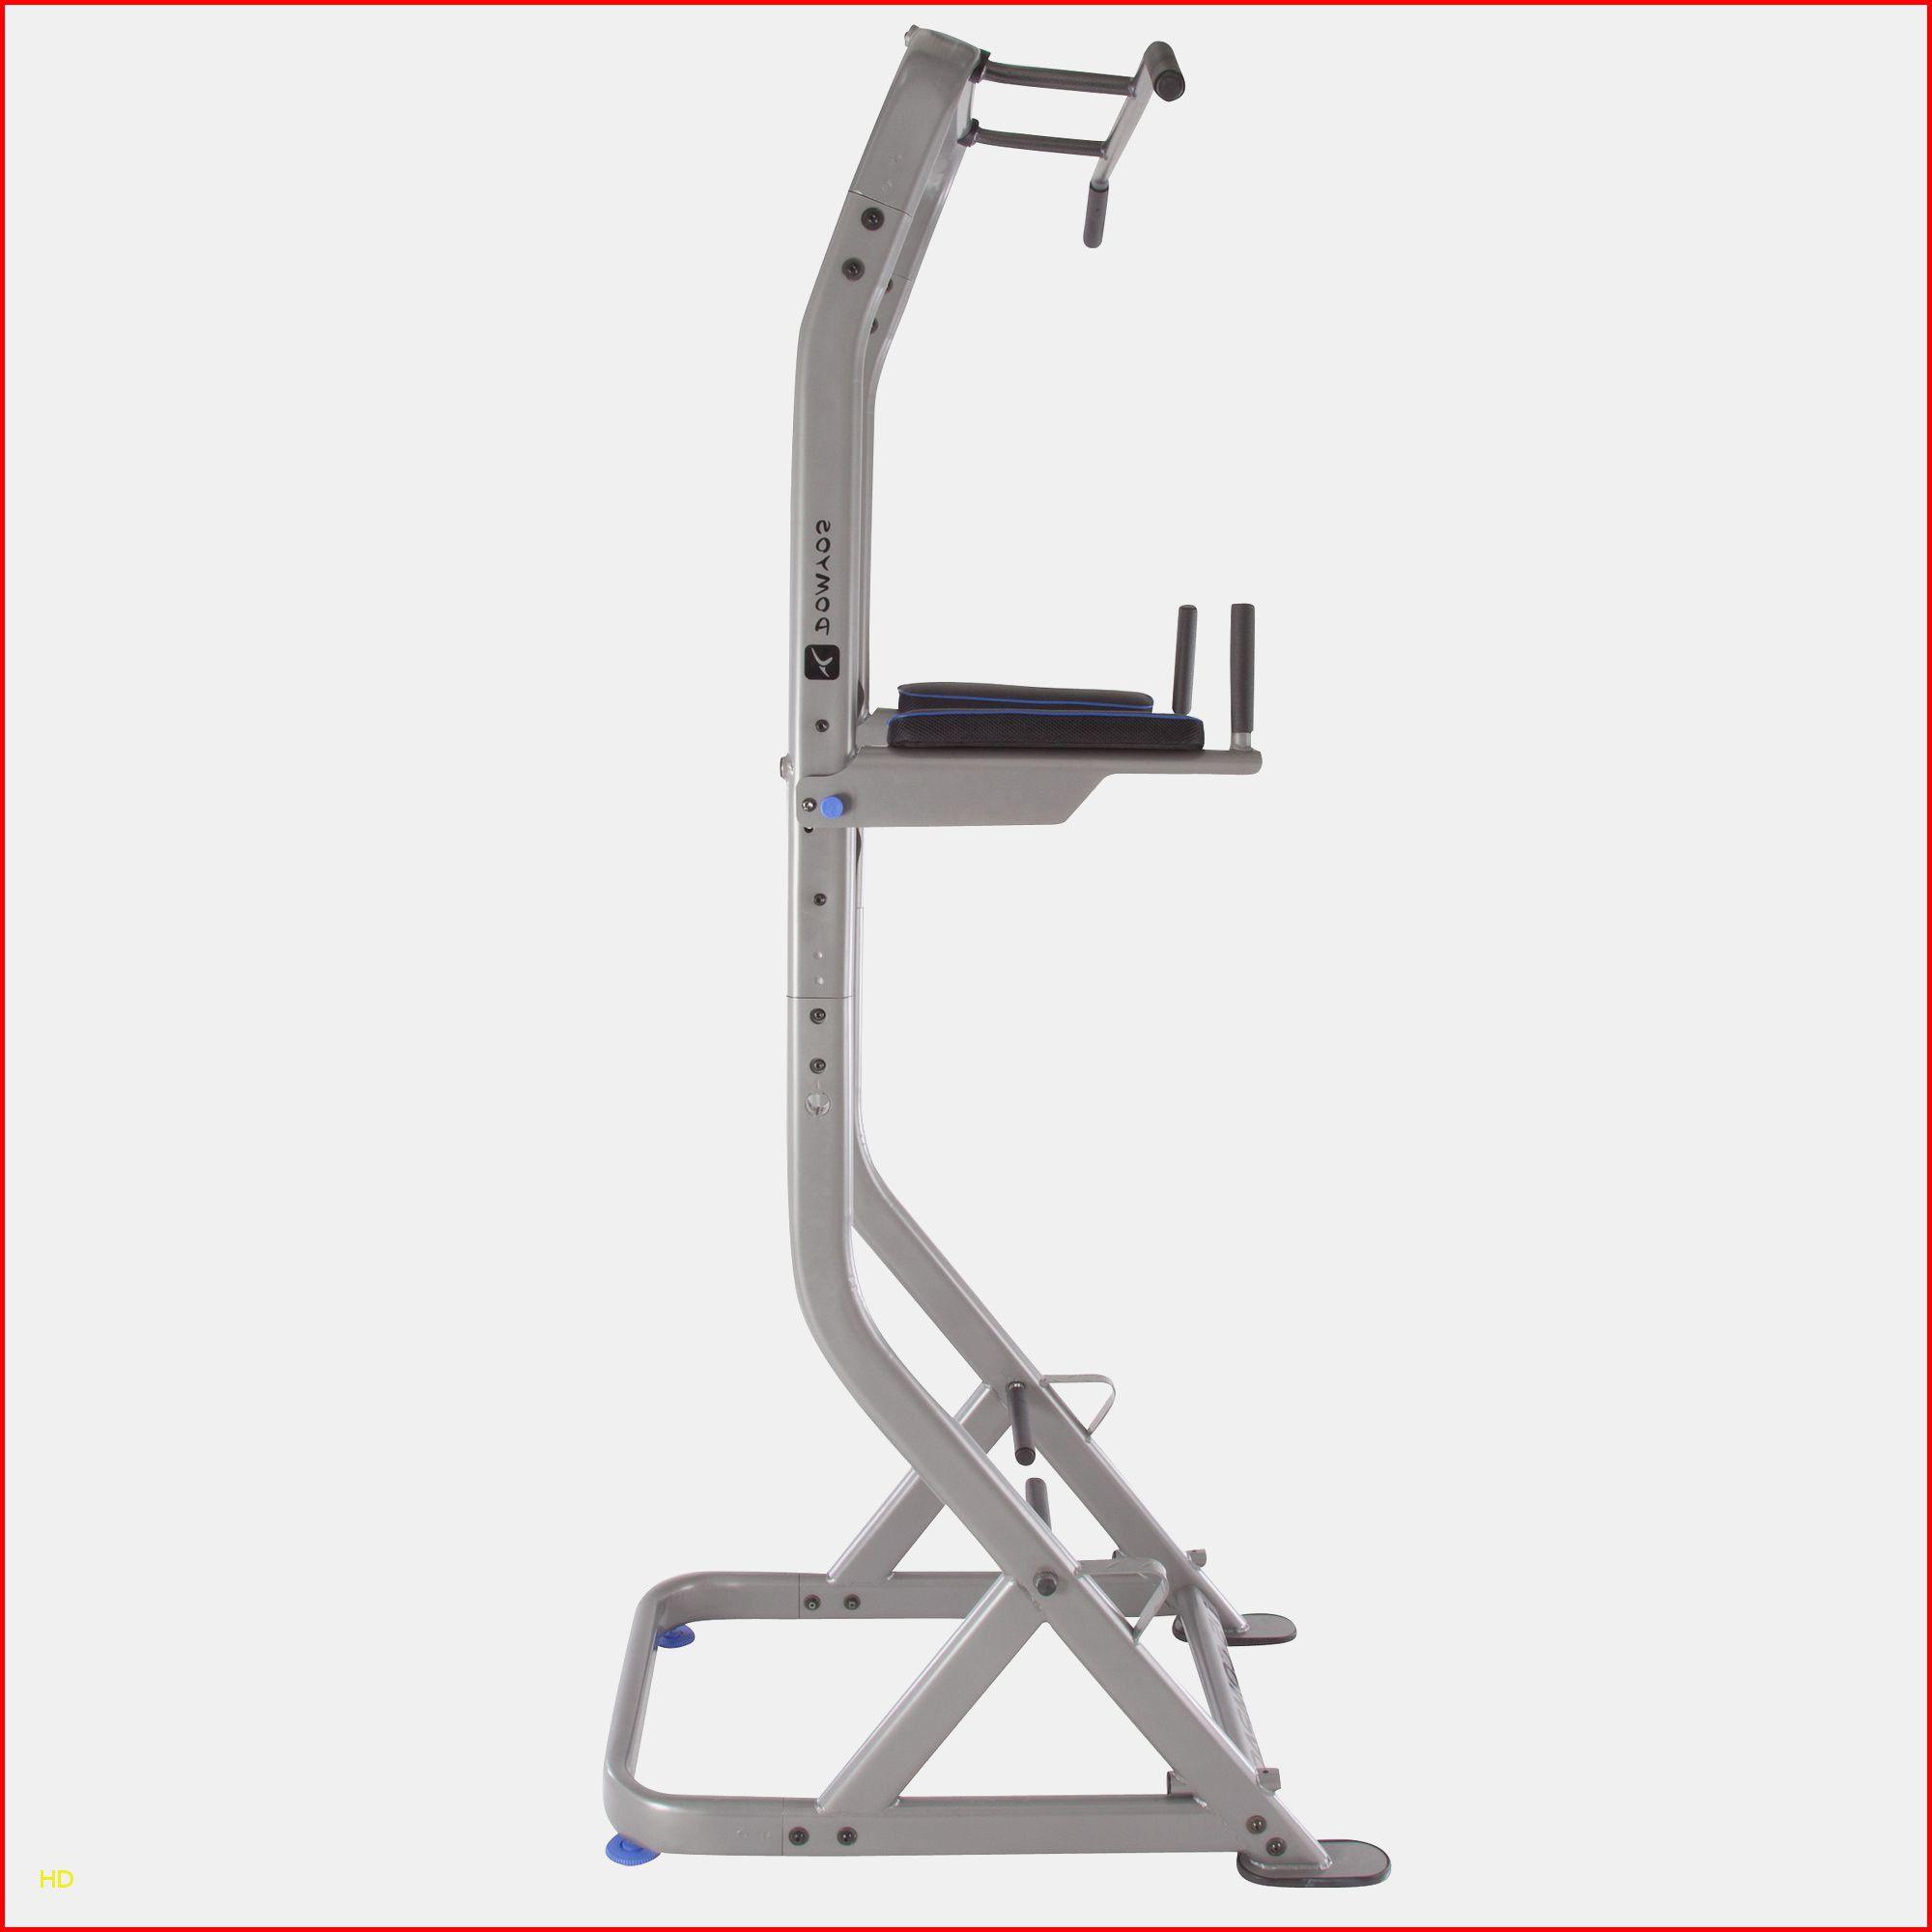 35 Unique Chaise Romaine Exercice Recommandations